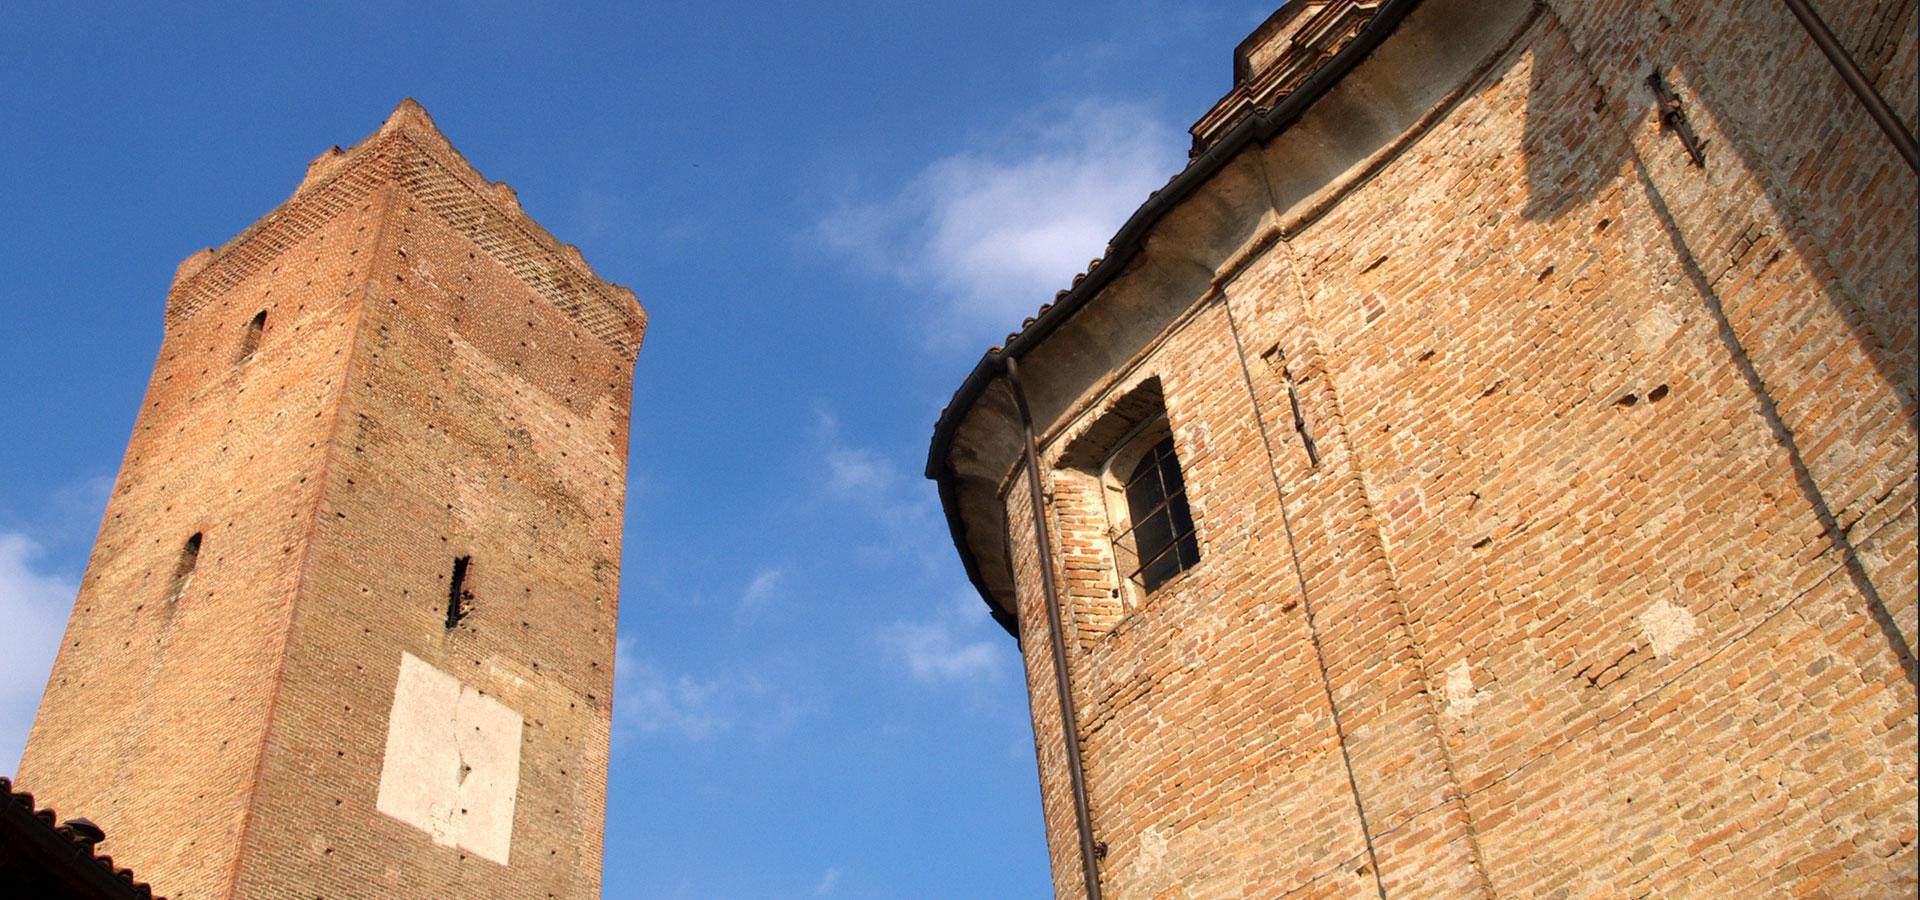 Torre-di-barbaresco-2